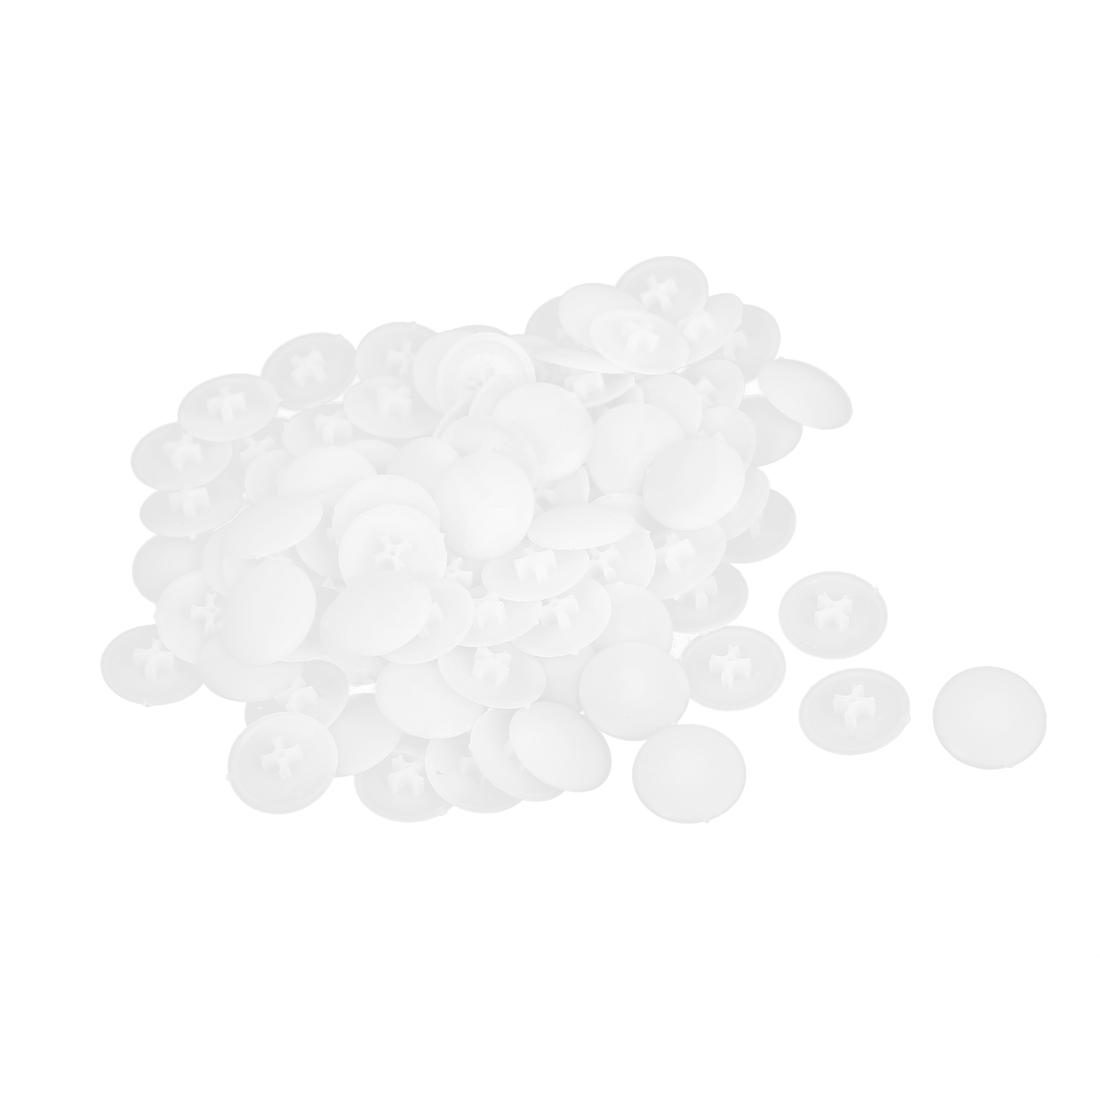 White Plastic Round Caps Furniture Press Fit Pozi Bolts Screws Cover 100pcs